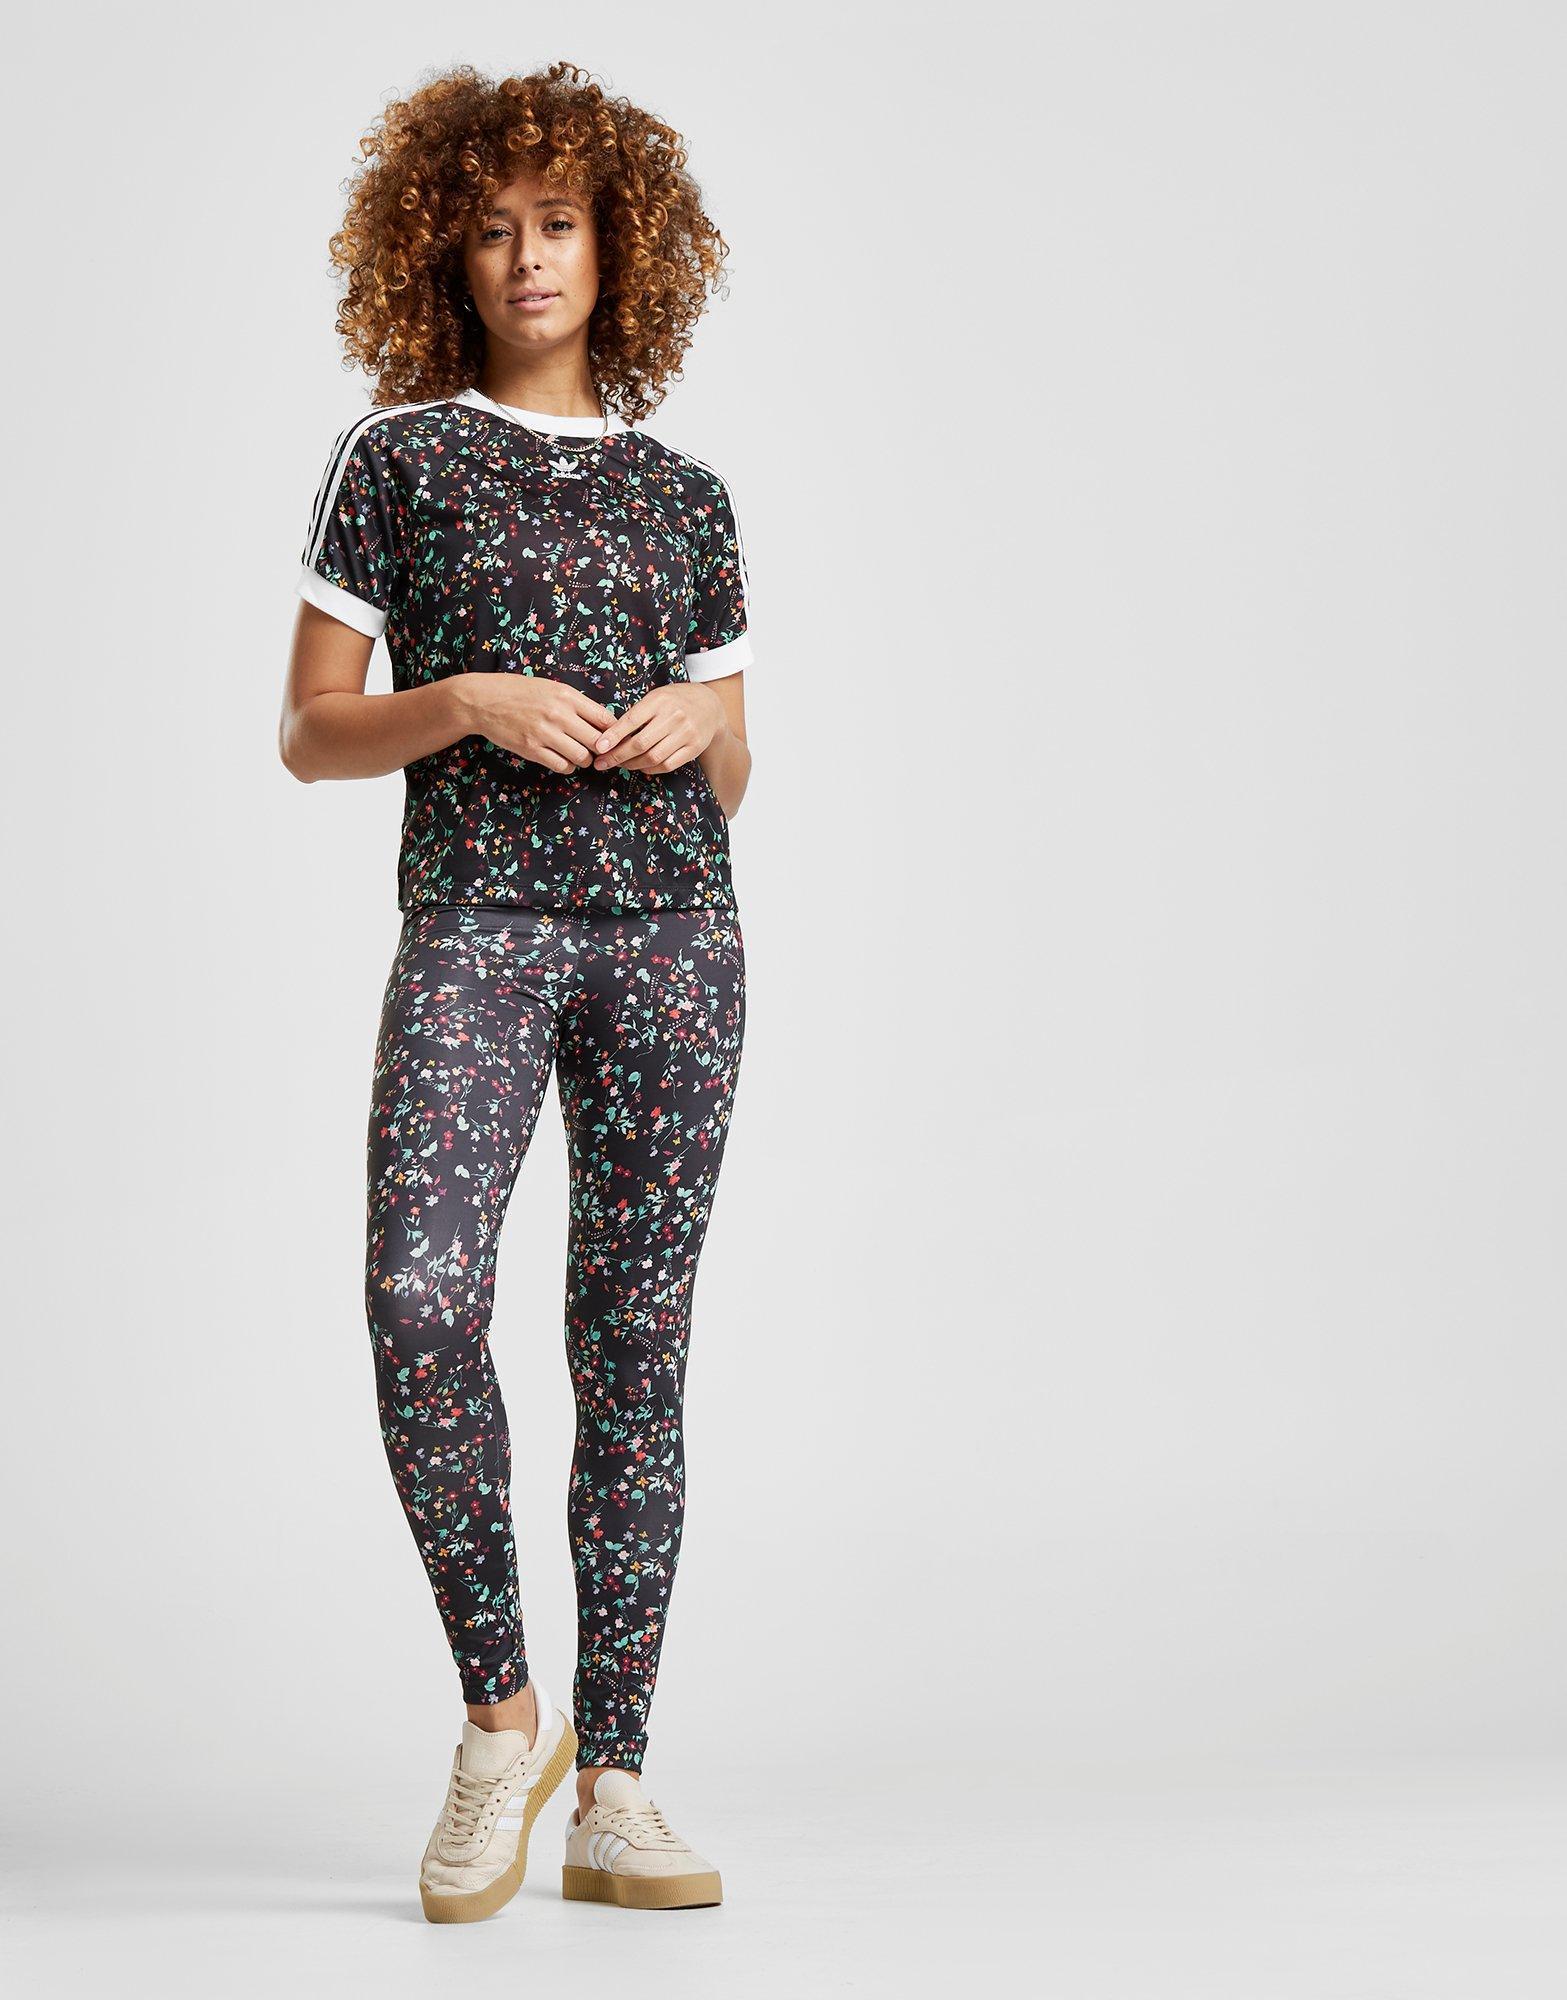 939f1d9115fc Lyst - adidas Originals Floral All Over Print T-shirt in Black